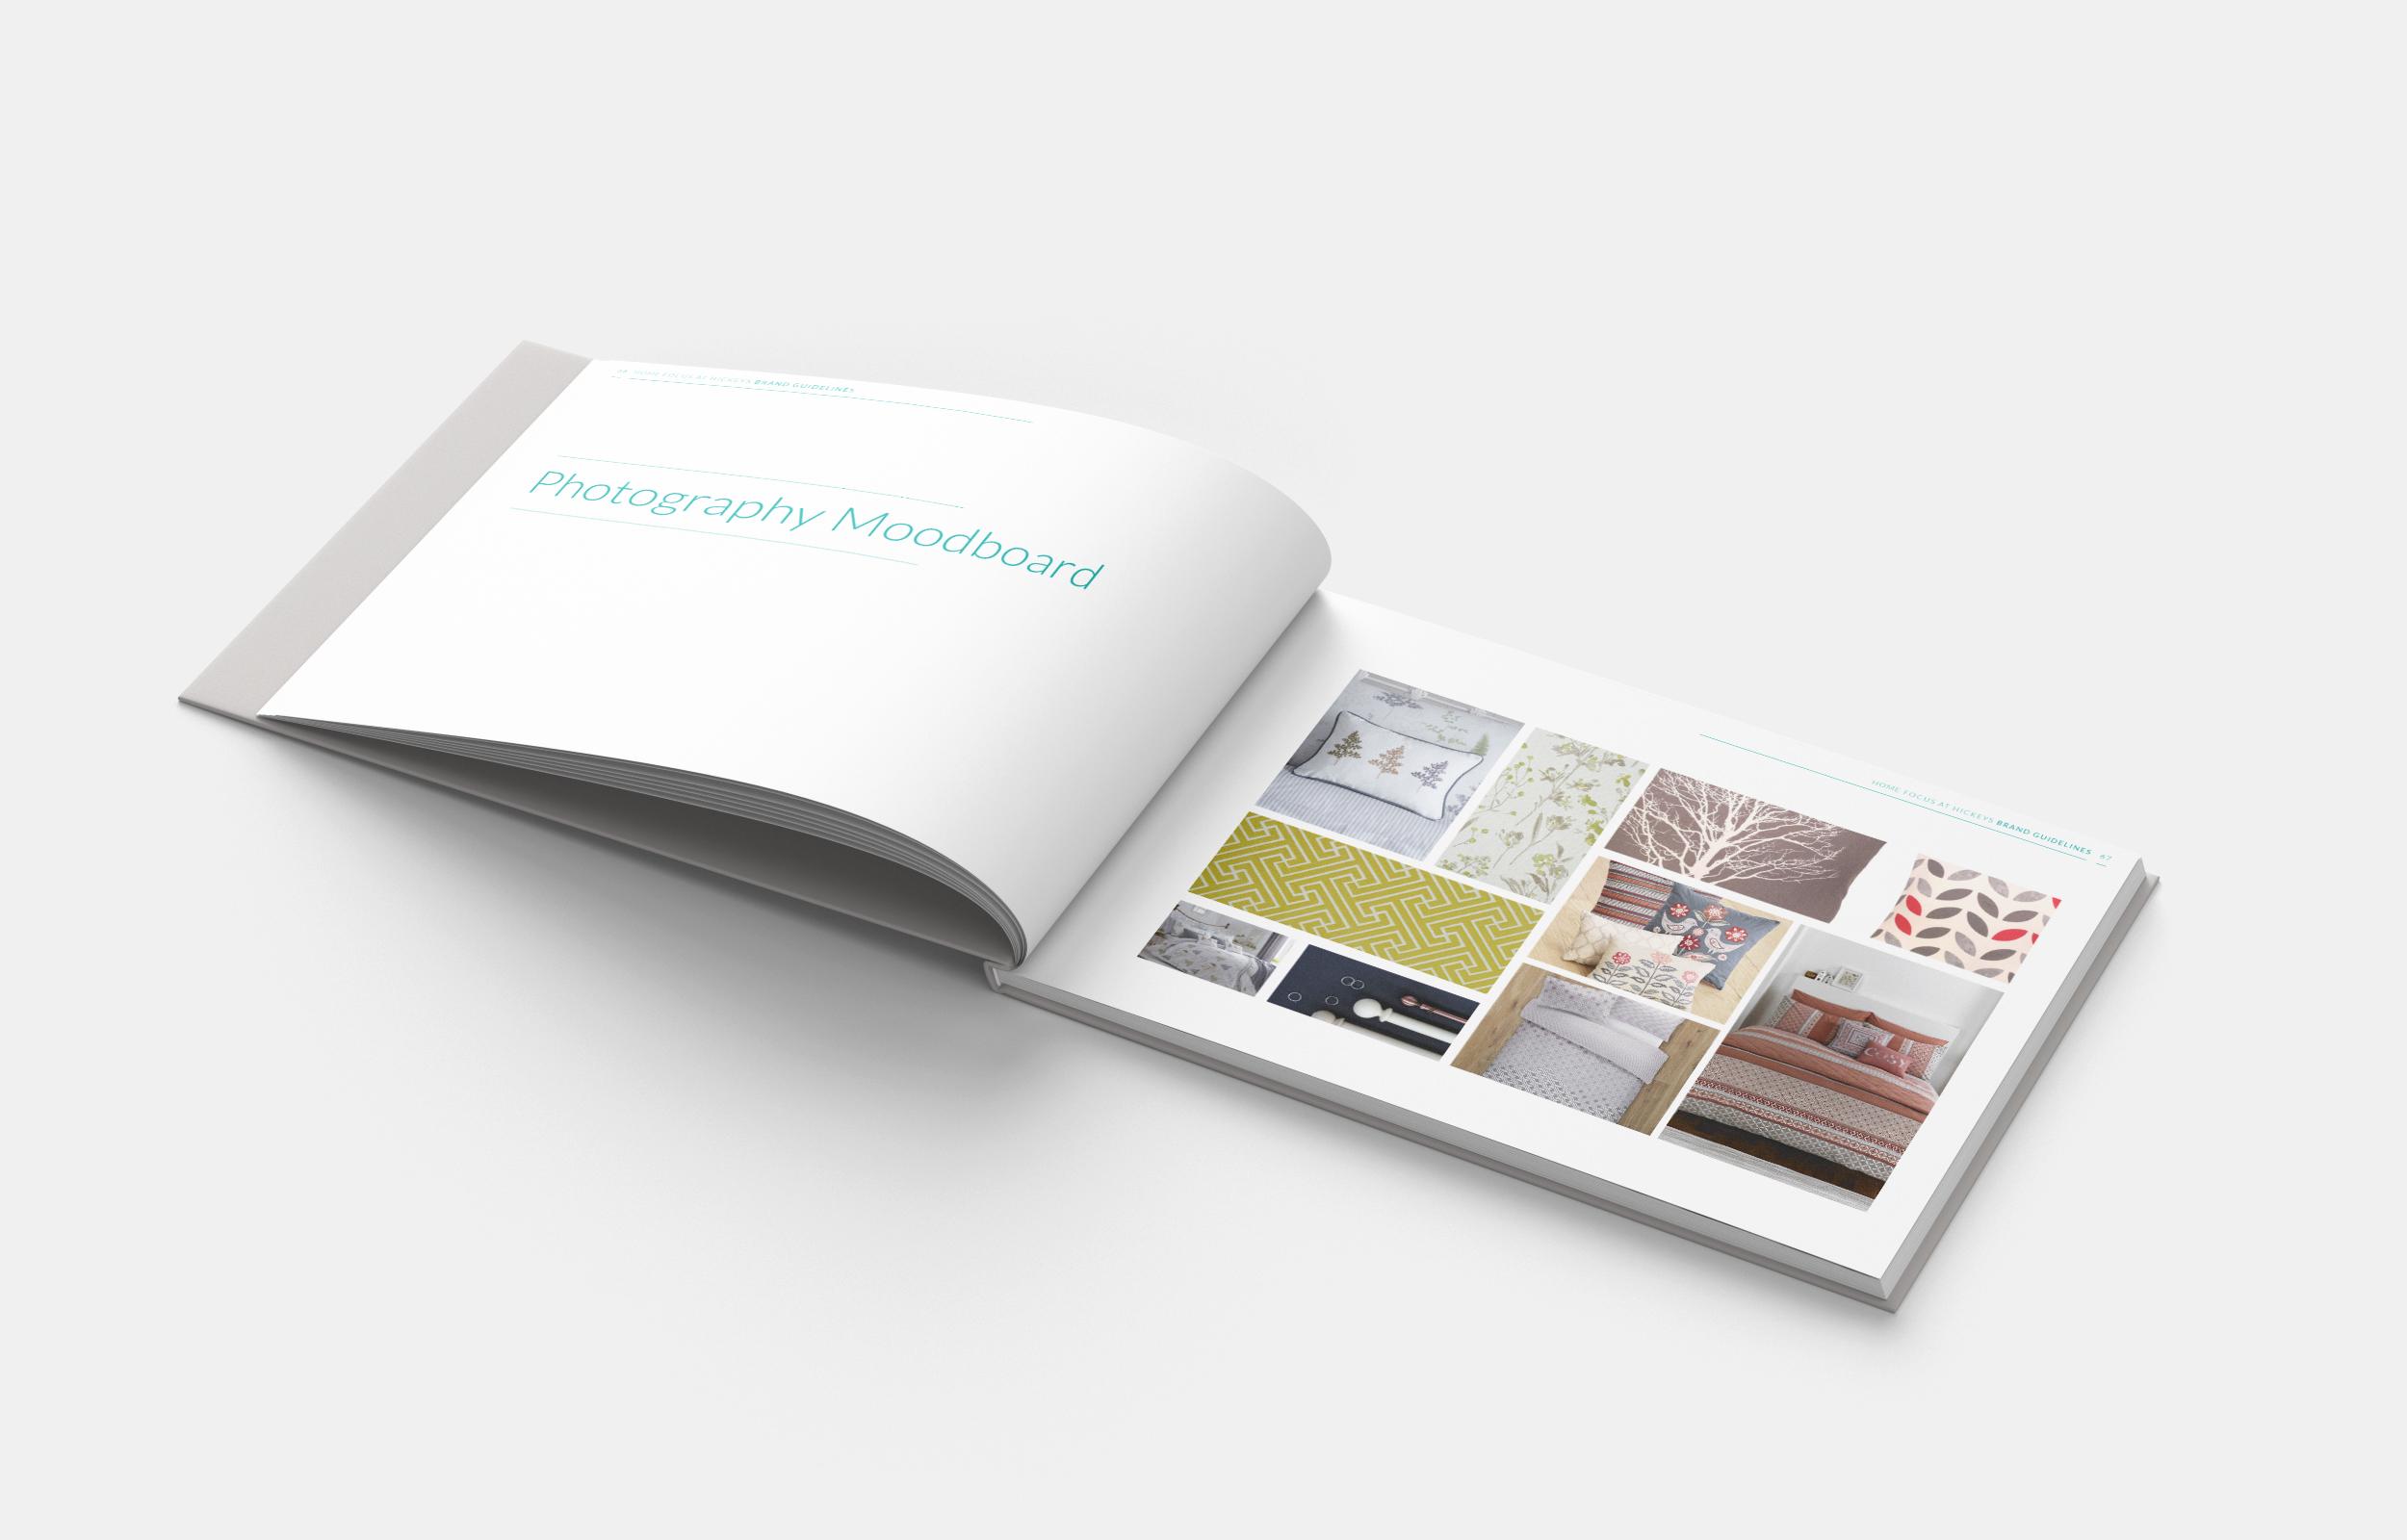 Horizontal_Book_Mockup_6.jpg